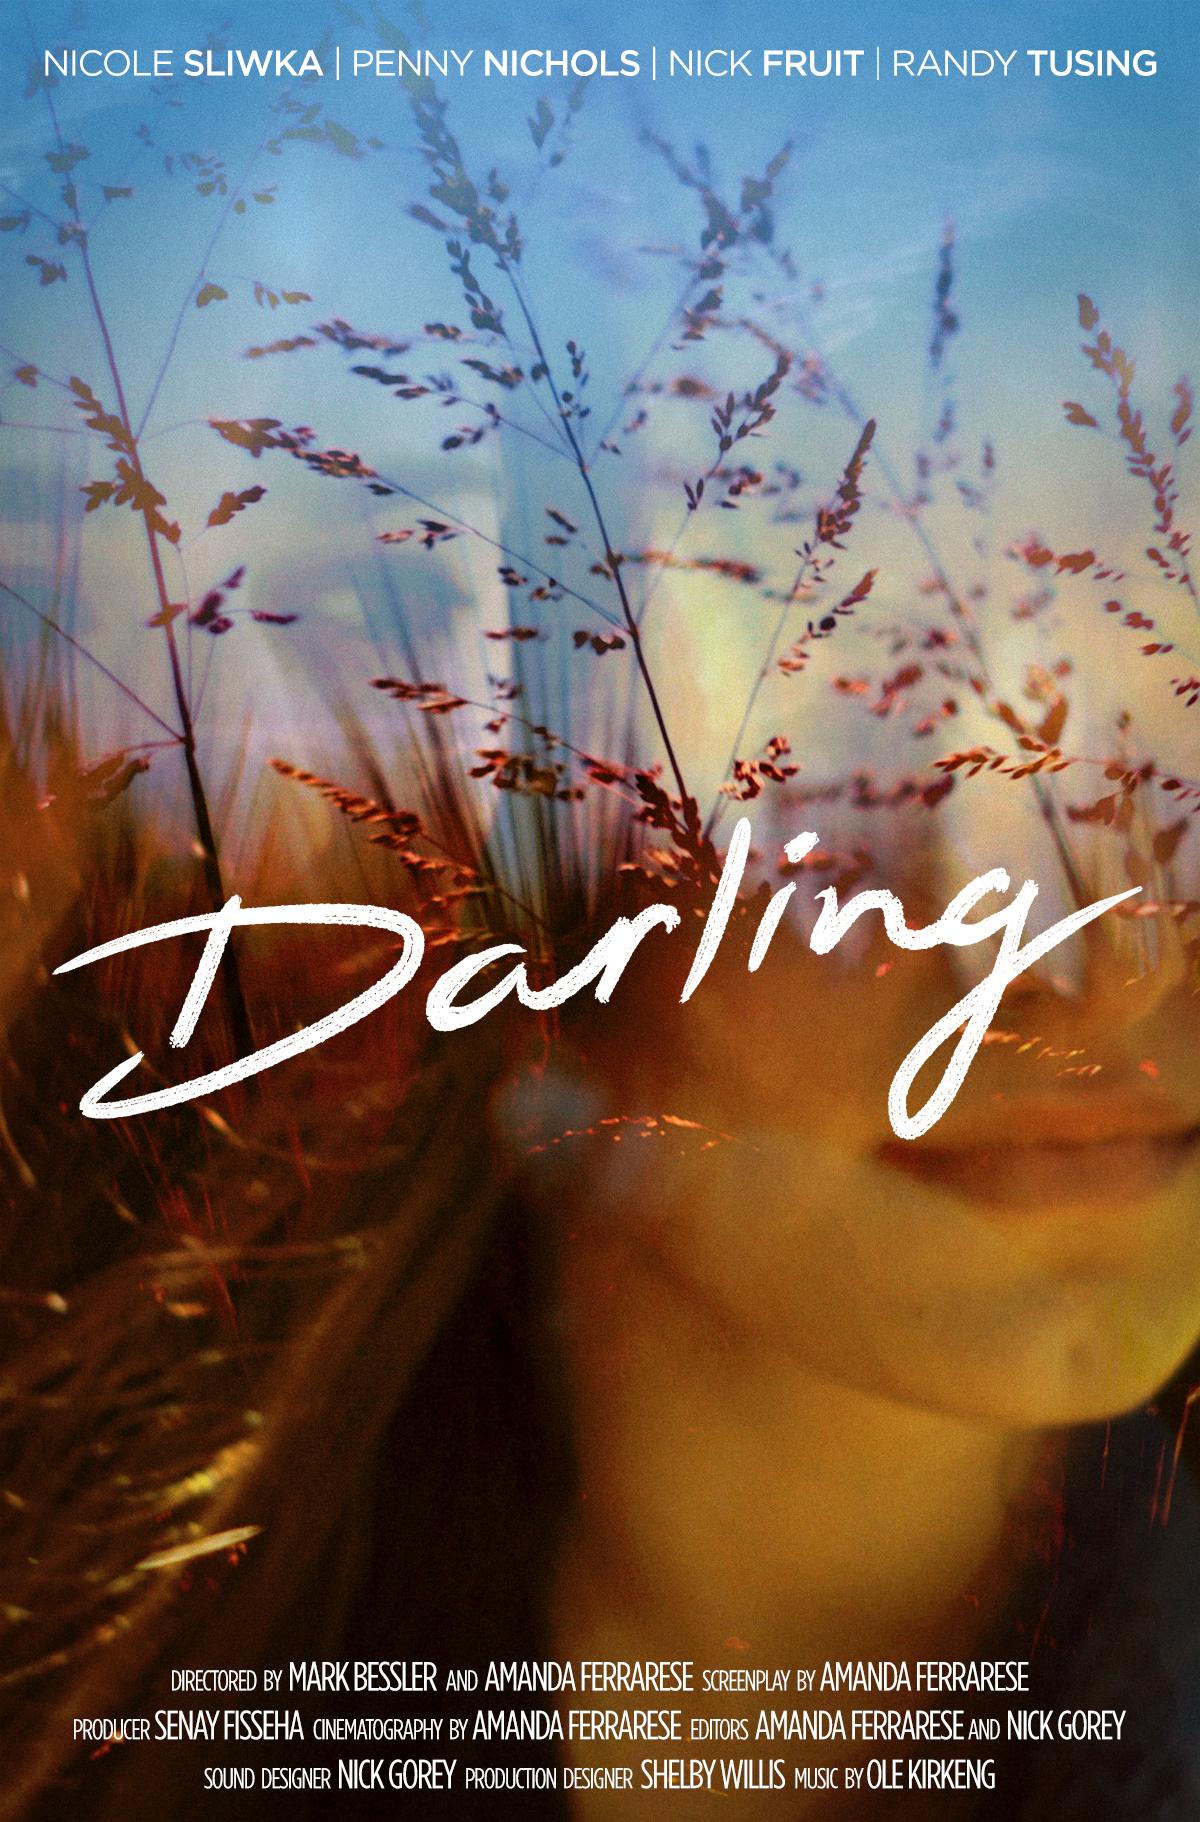 Darling - Poster design for Darling, a short film by Amanda Ferrarese.←back